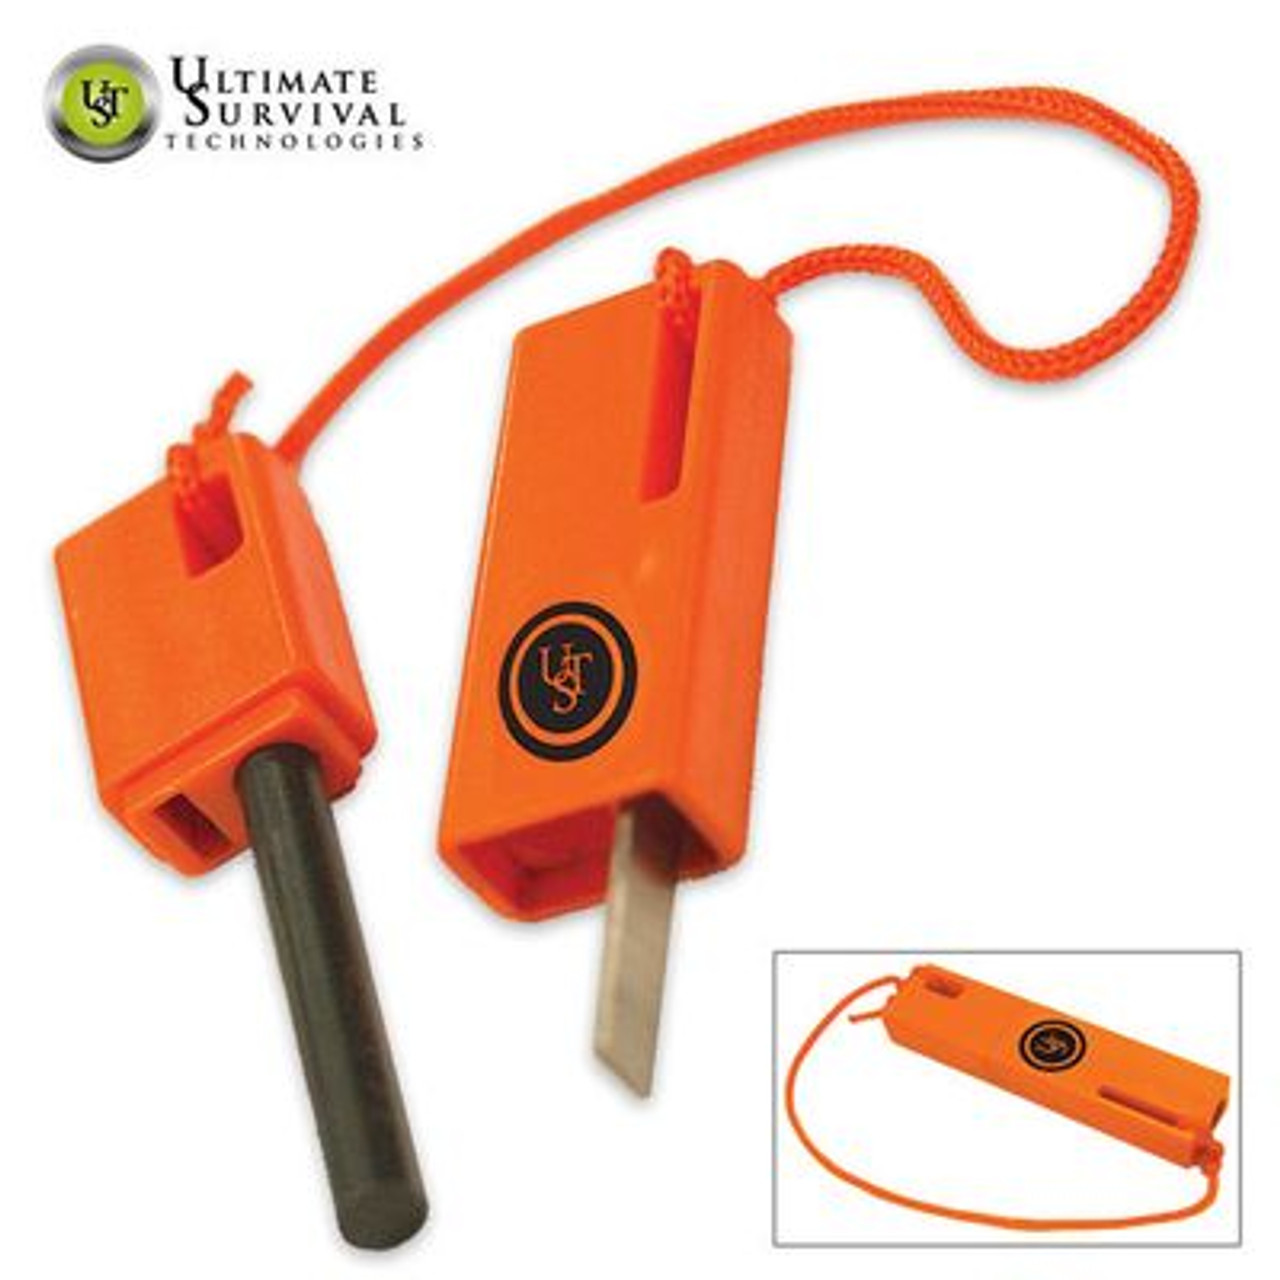 Ultimate Survival Technologies SparkForce Fire Starter Orange Mini Flint Striker